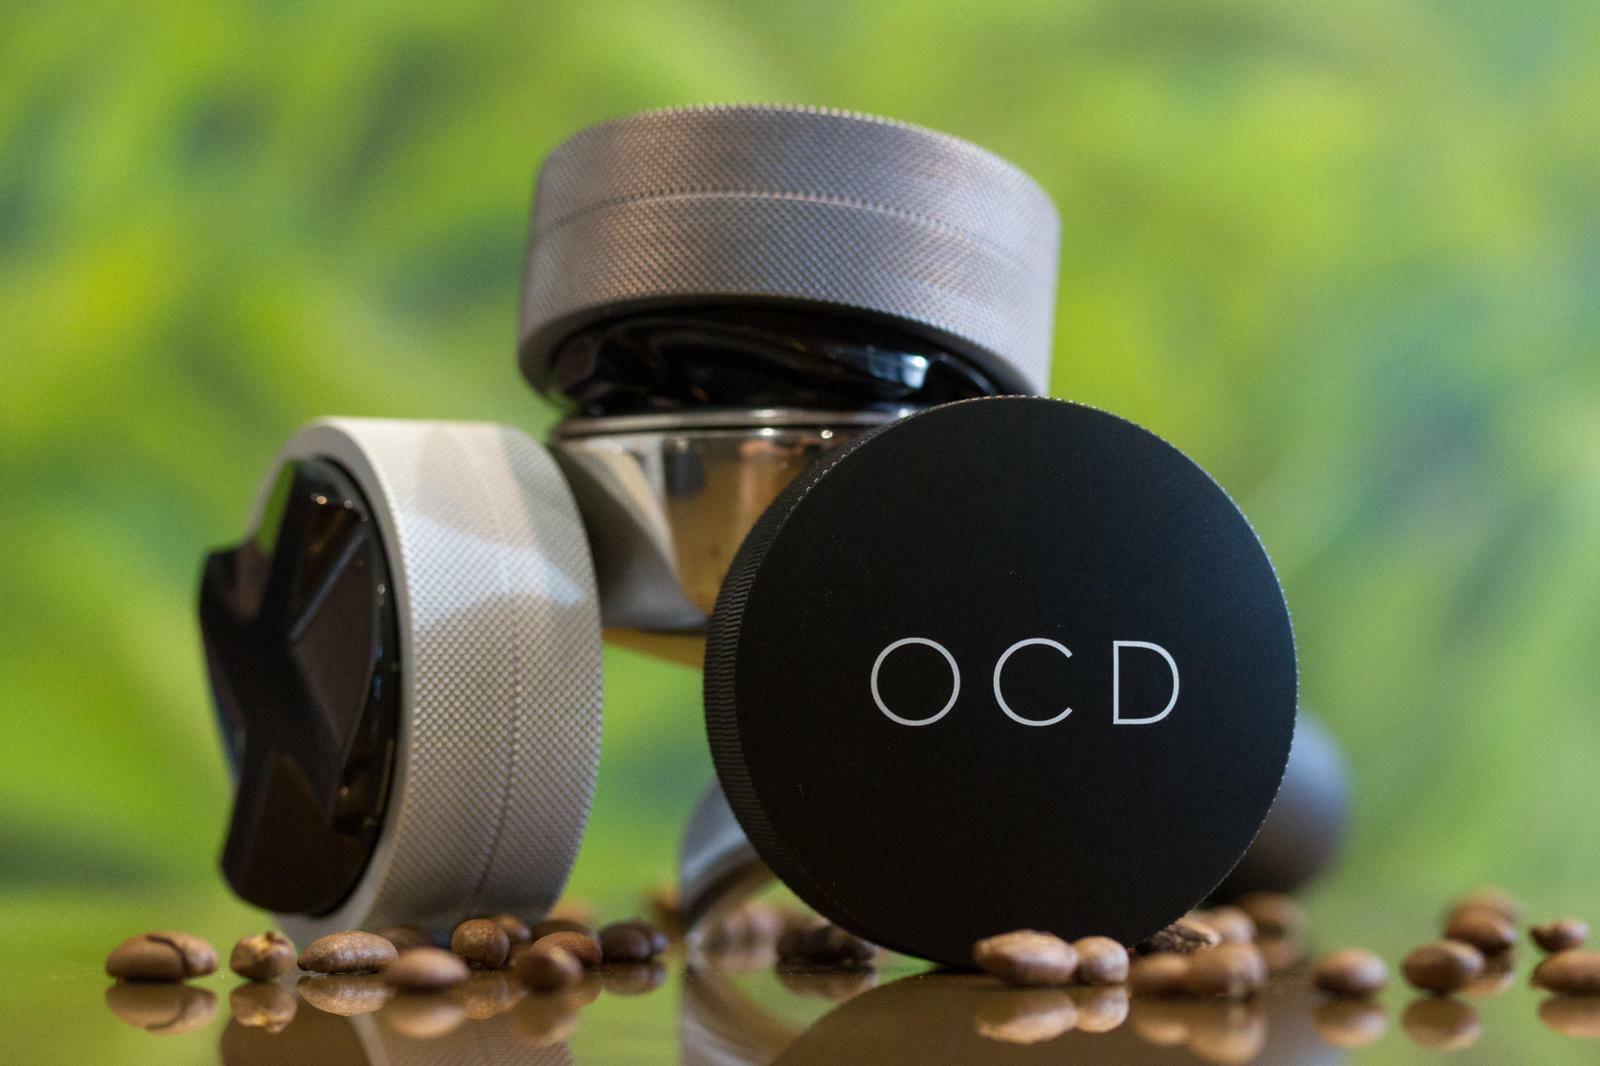 NCD Nucleus Coffee Distributor ディストリビューター ブラック